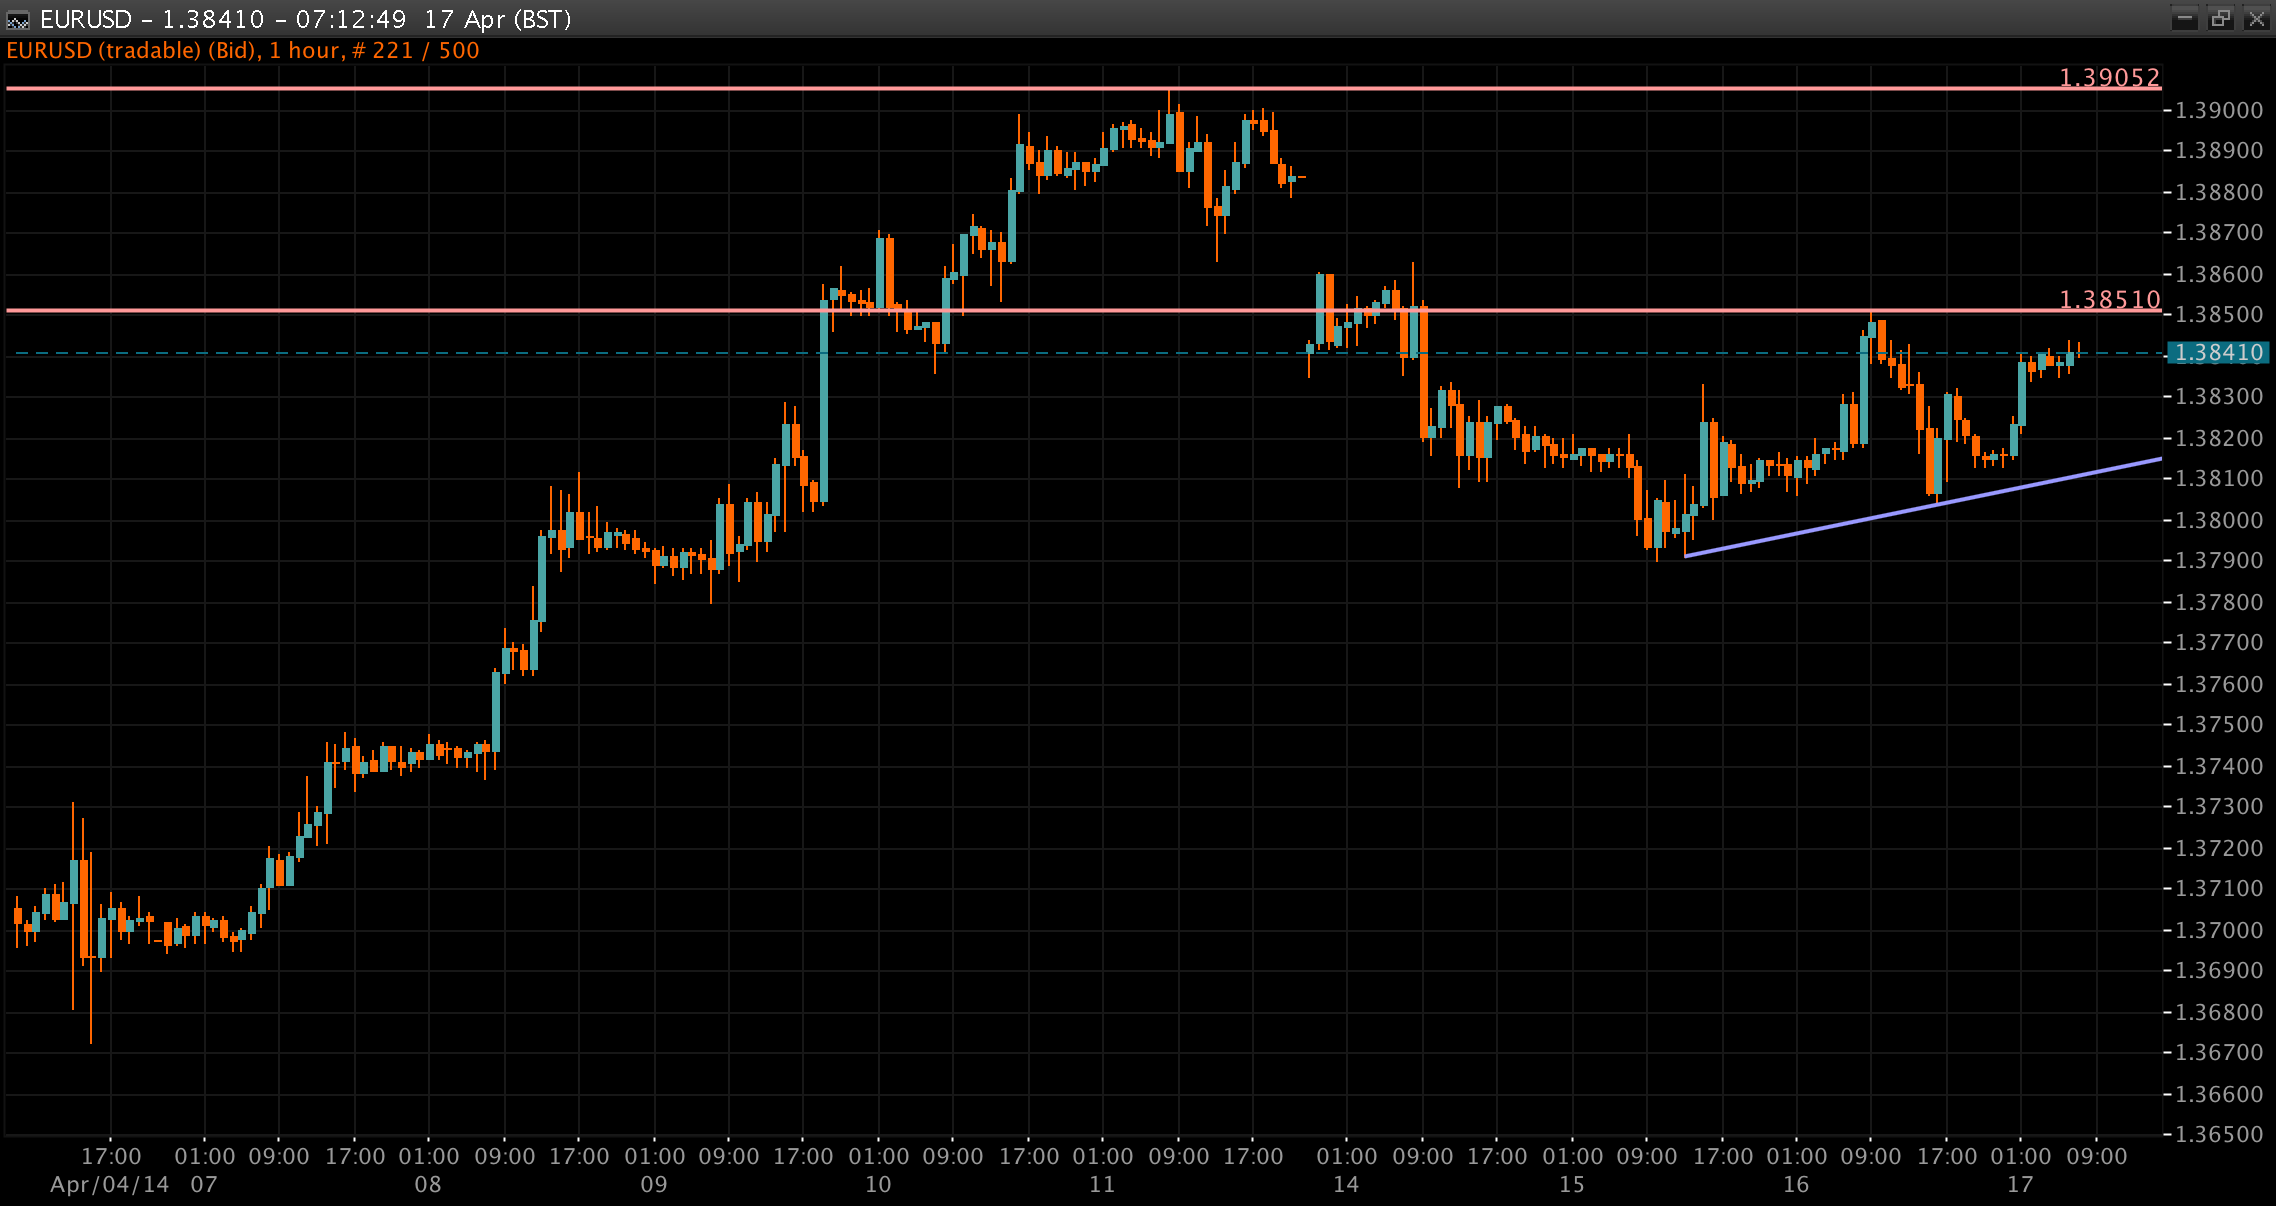 EUR/USD Chart 17 Apr 2014